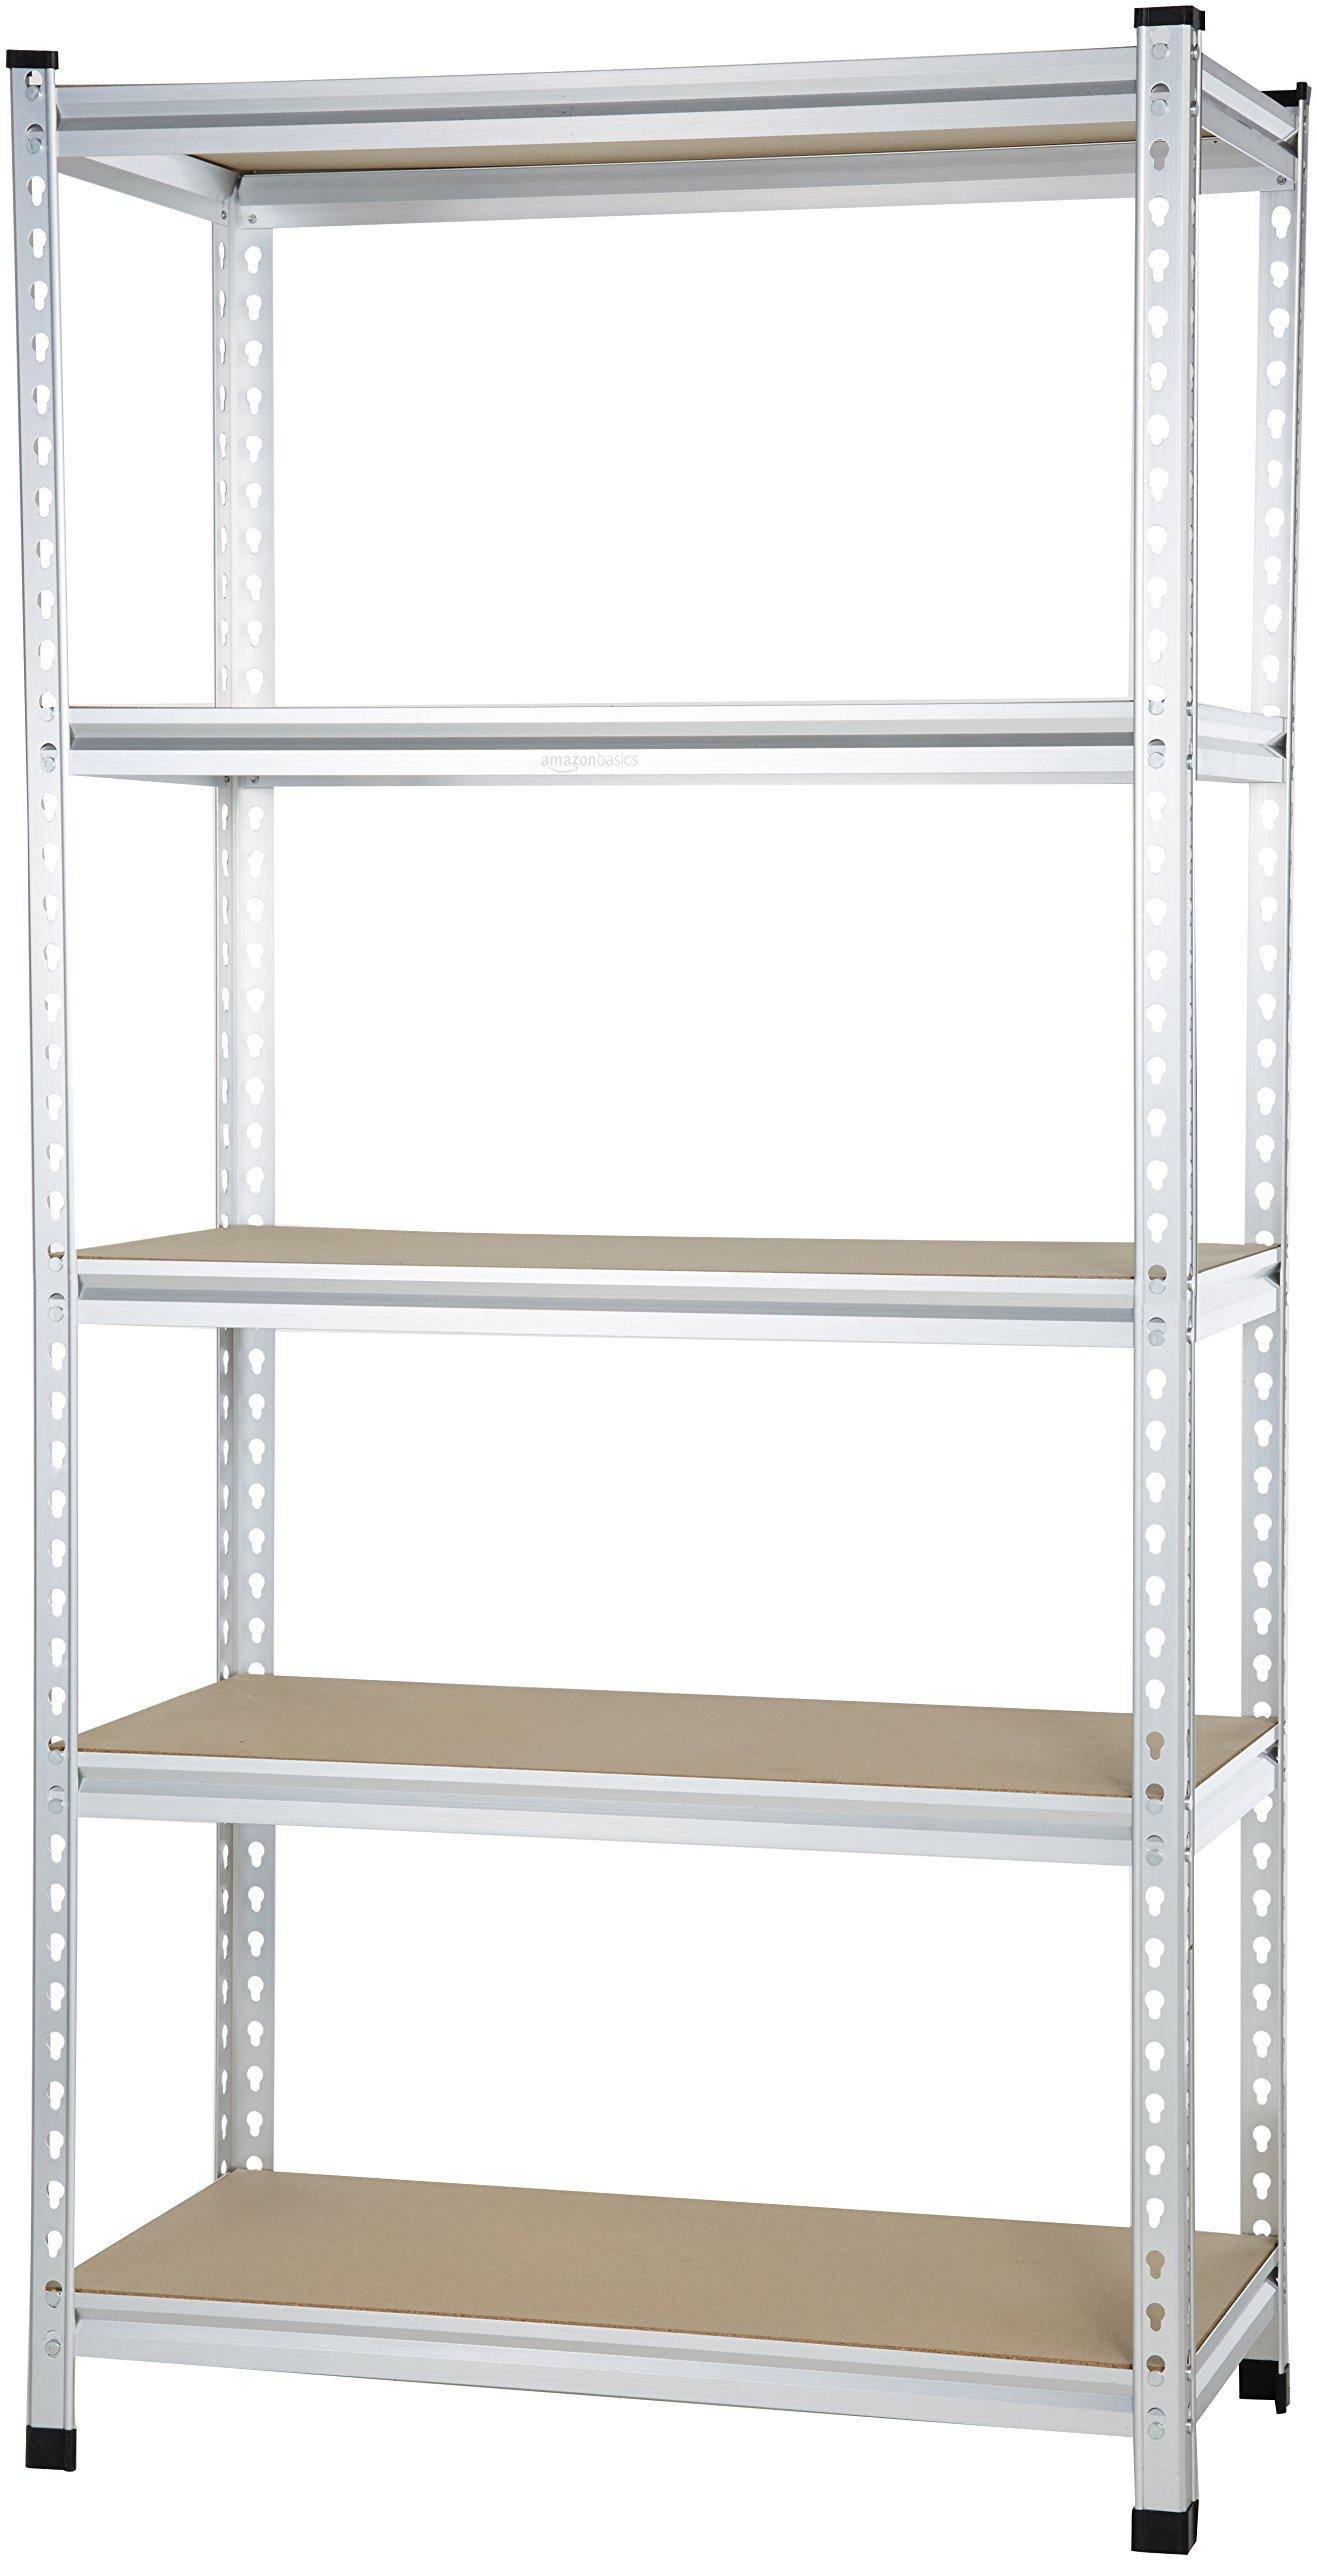 AmazonBasics Medium Duty Shelving Double-Post Press Board Shelf - 36 x 18 x 72